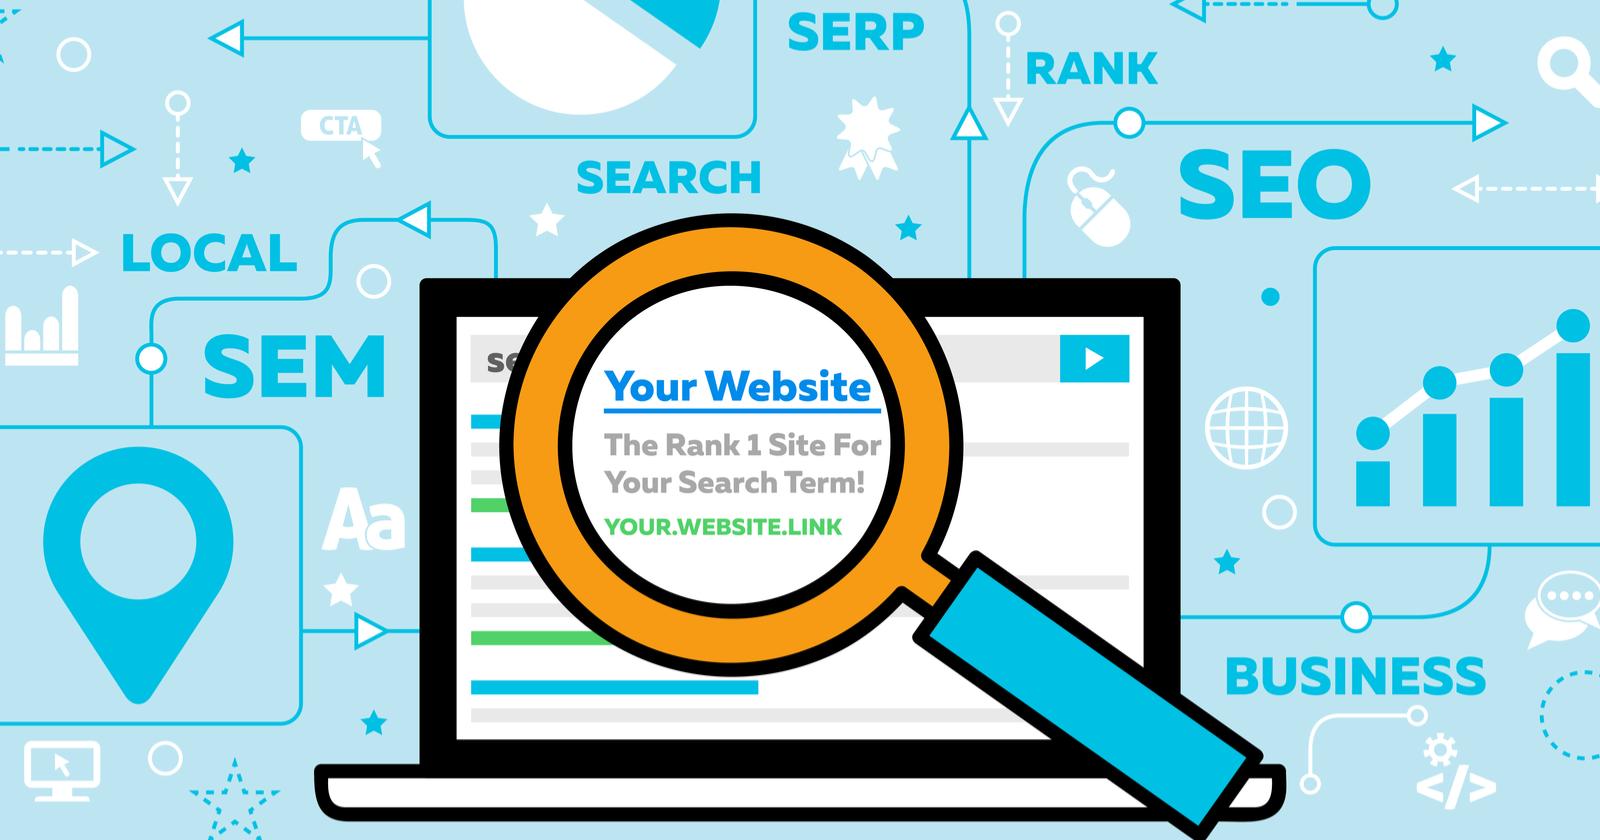 rank a website